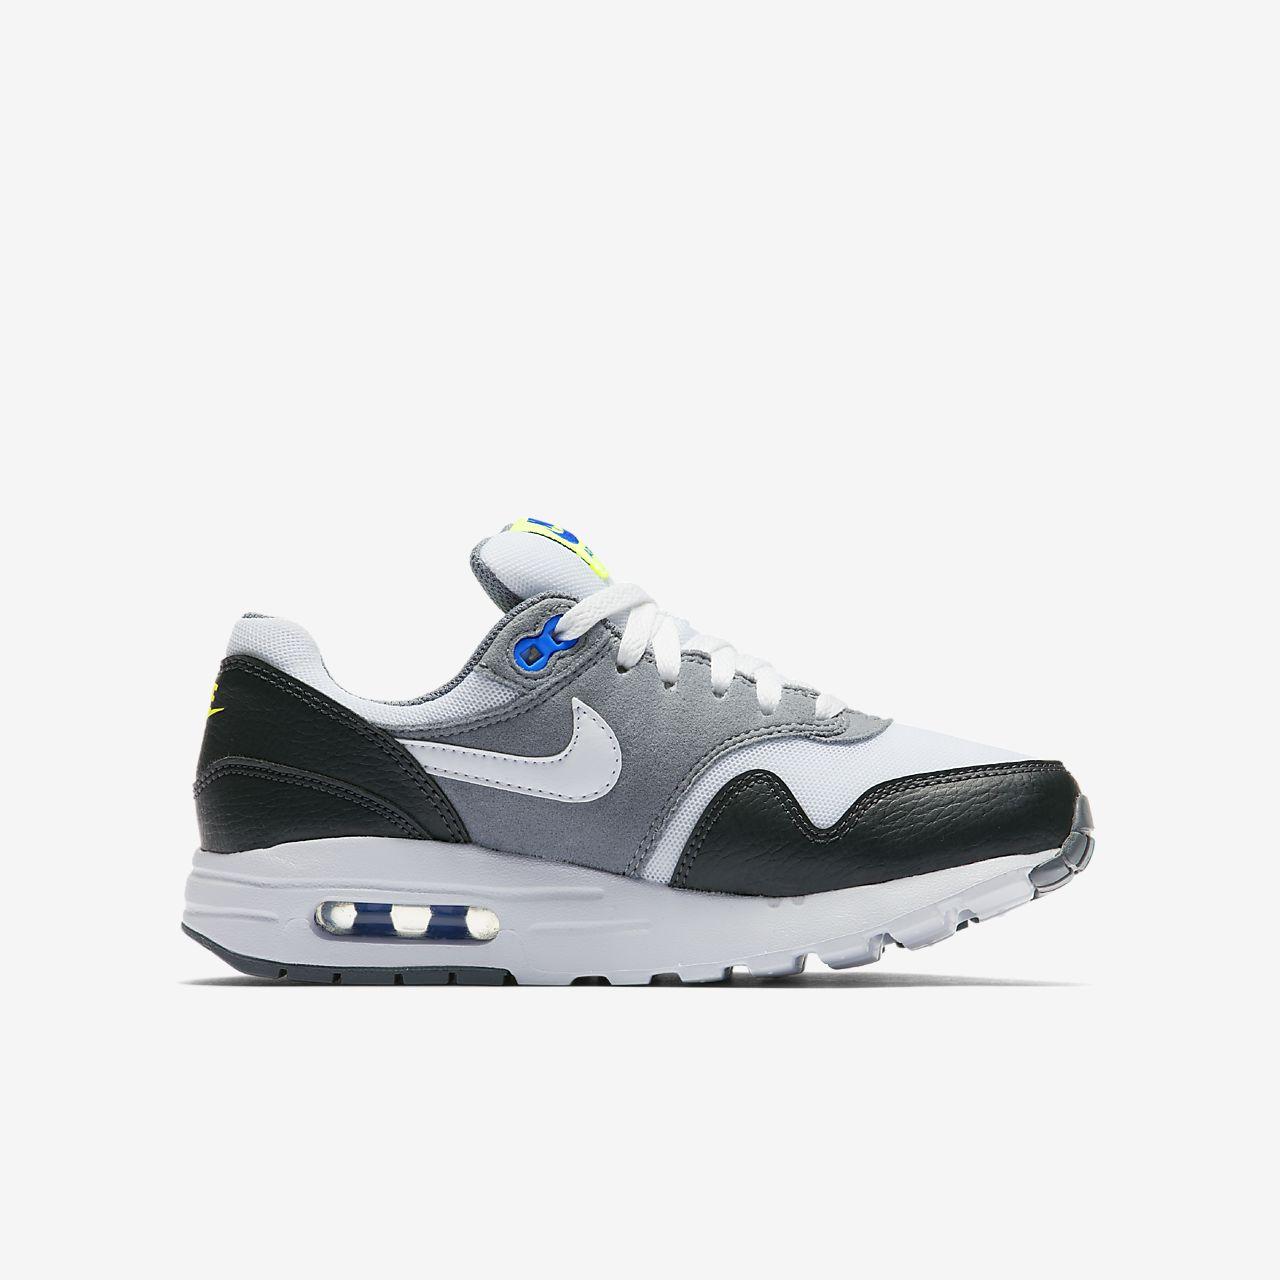 Cheap Nike Air Max 1 UK |